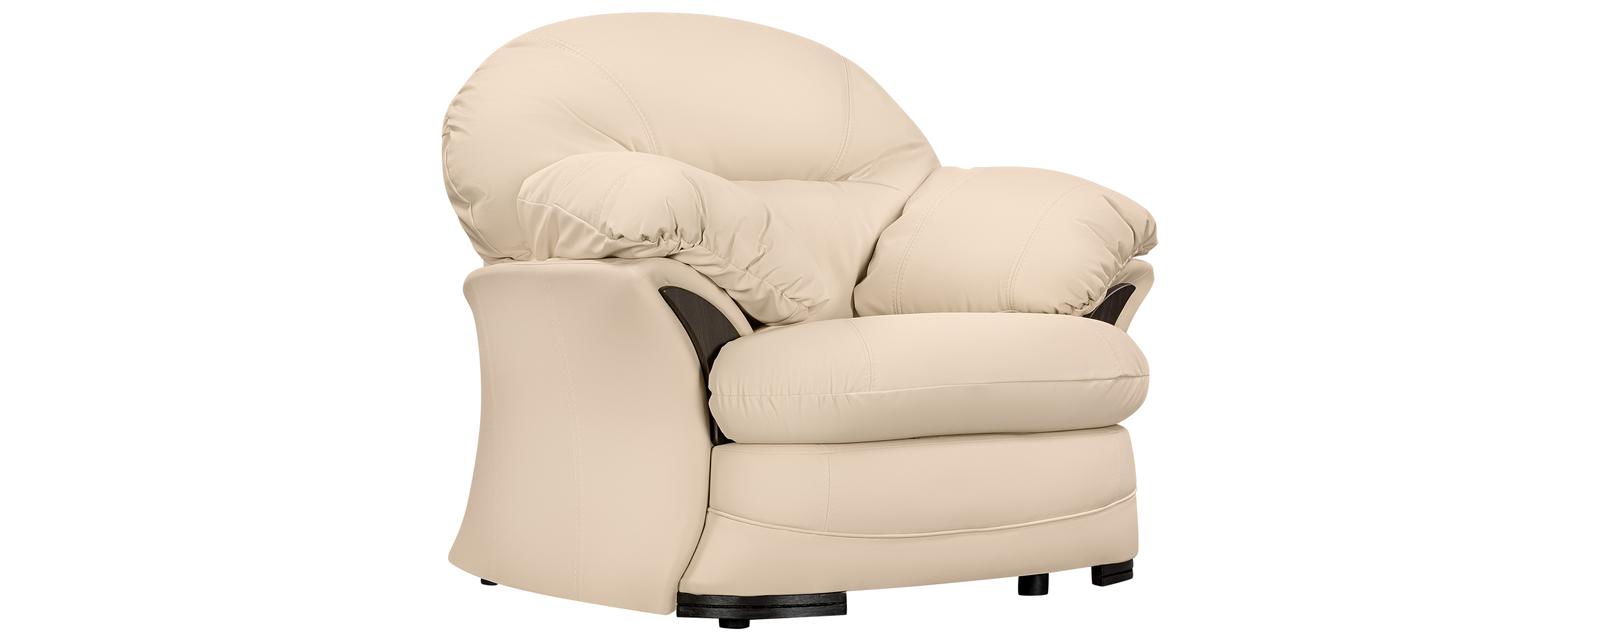 Кресло кожаное Ланкастер Бежевый (Натуральная кожа)